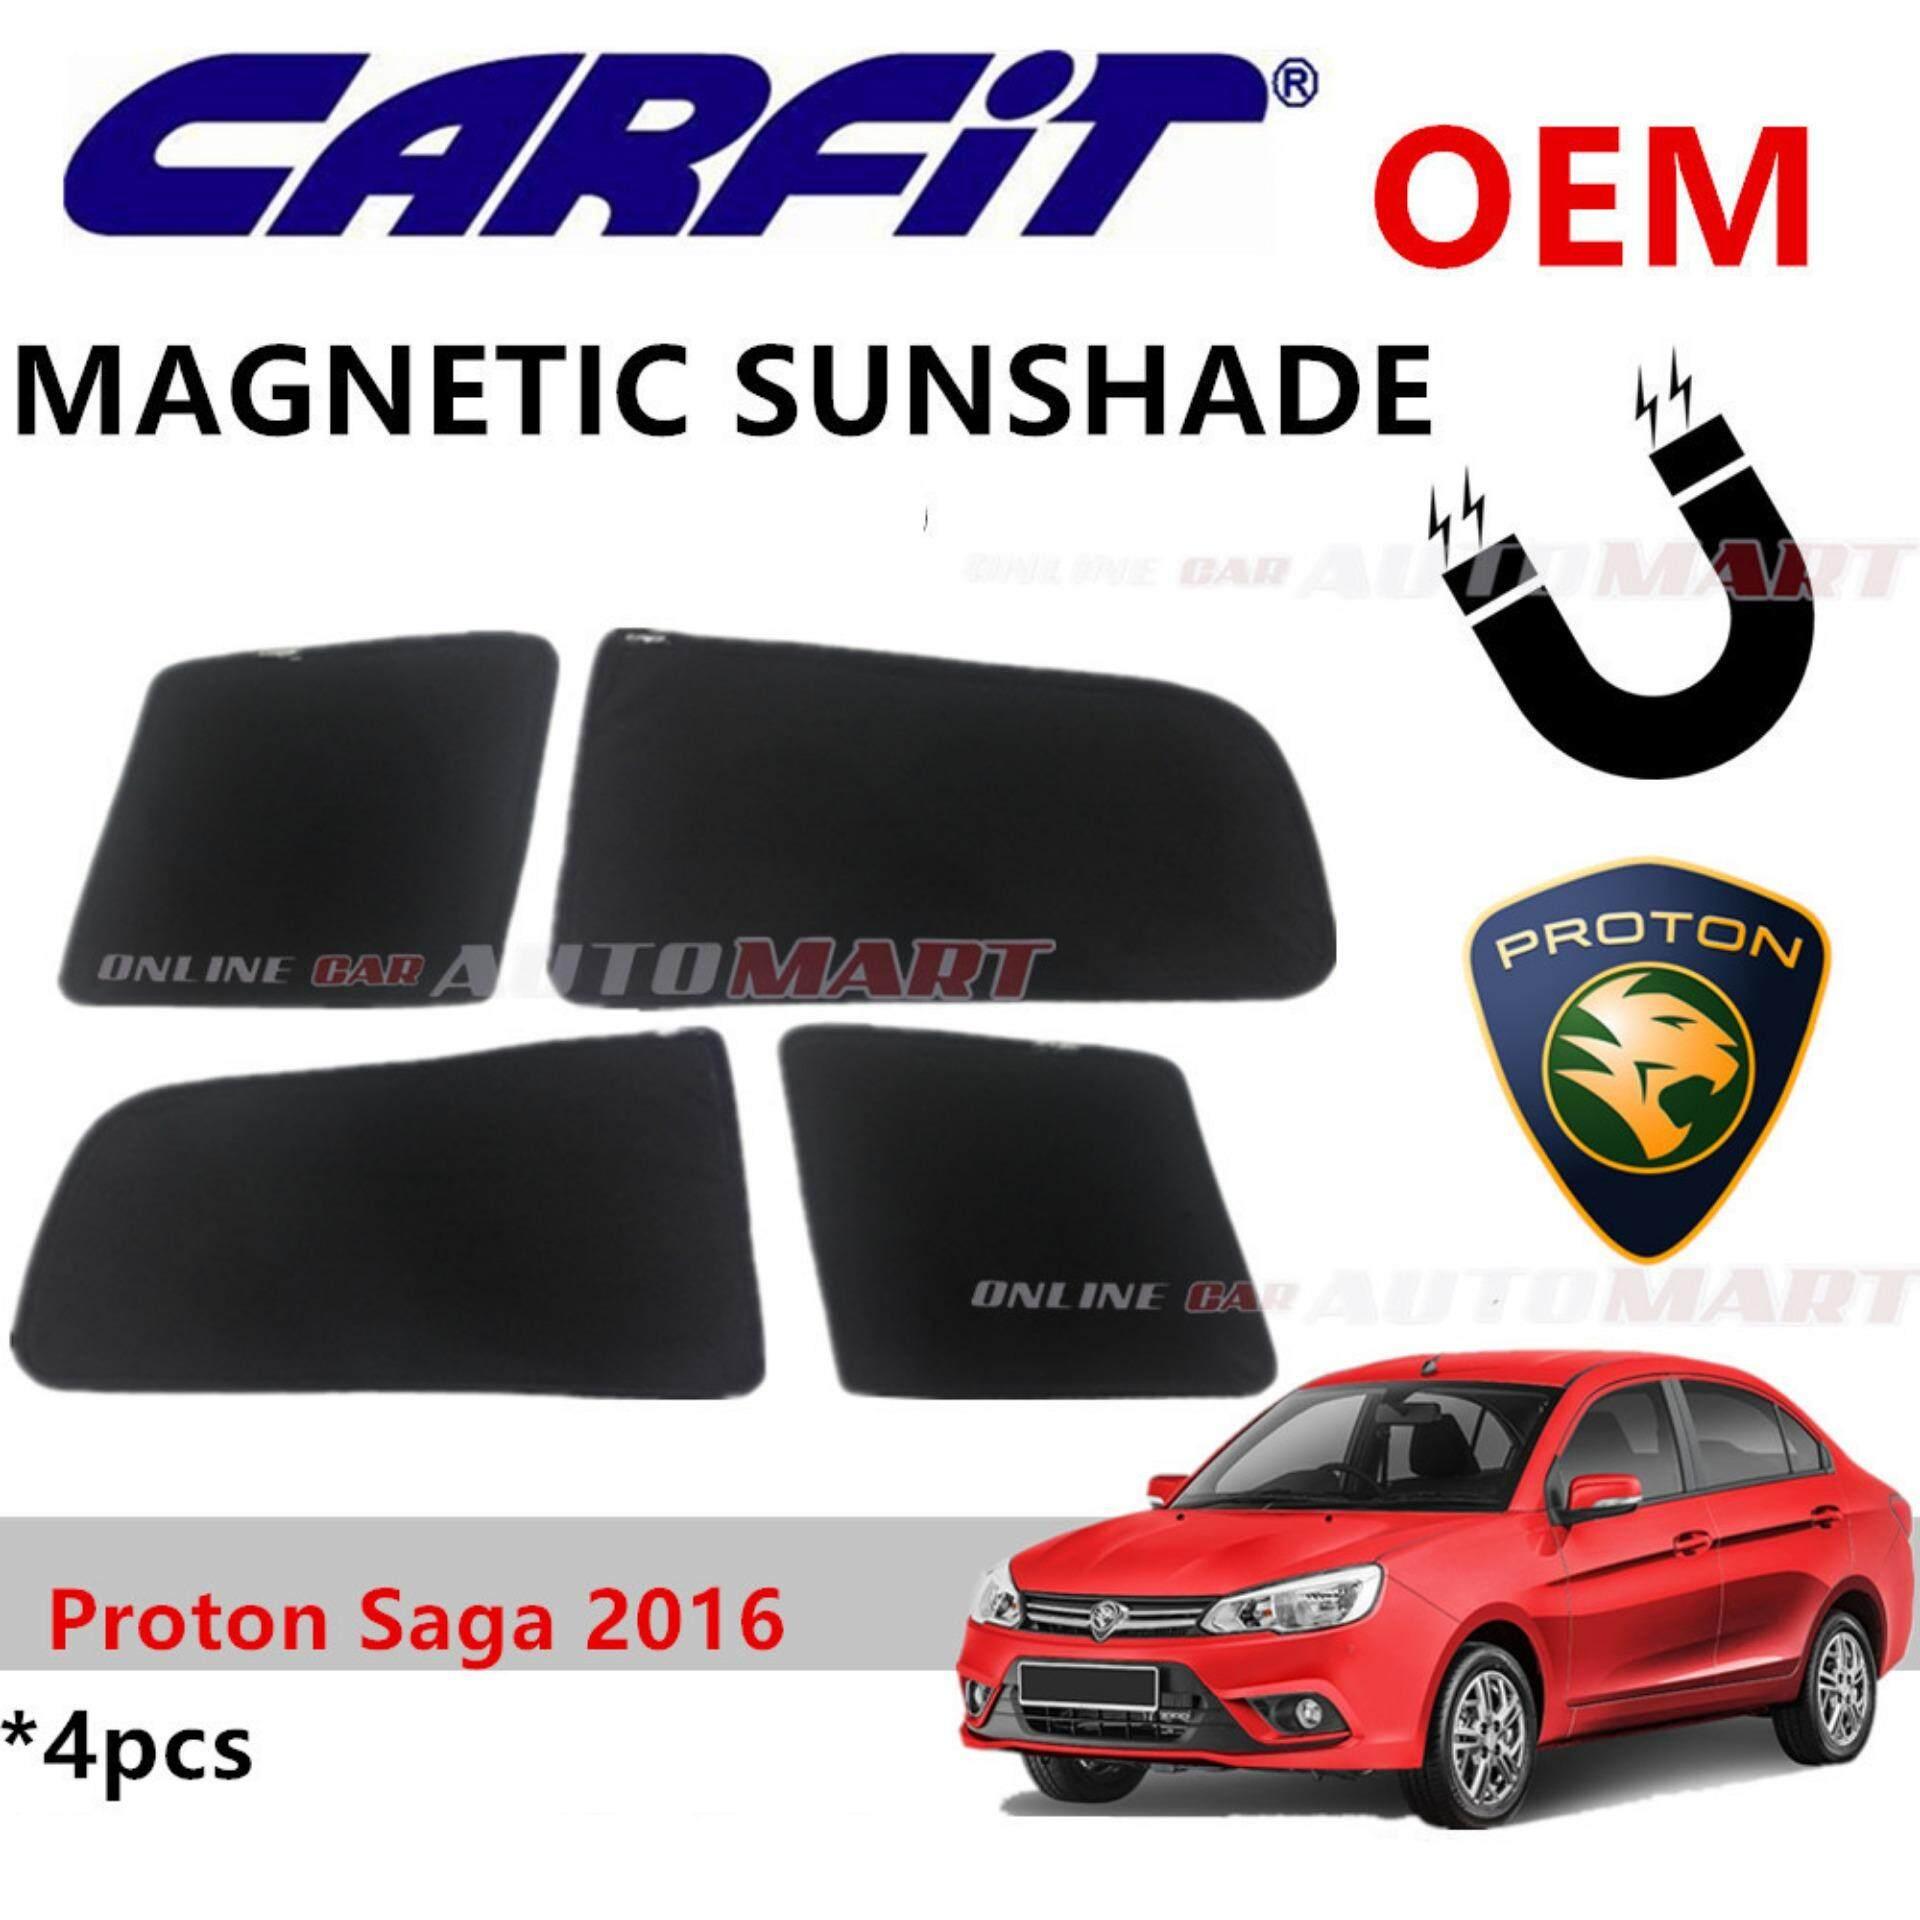 CARFIT OEM Magnetic Custom Fit Sunshade For Proton Saga Yr 2016 (4pcs Sets)